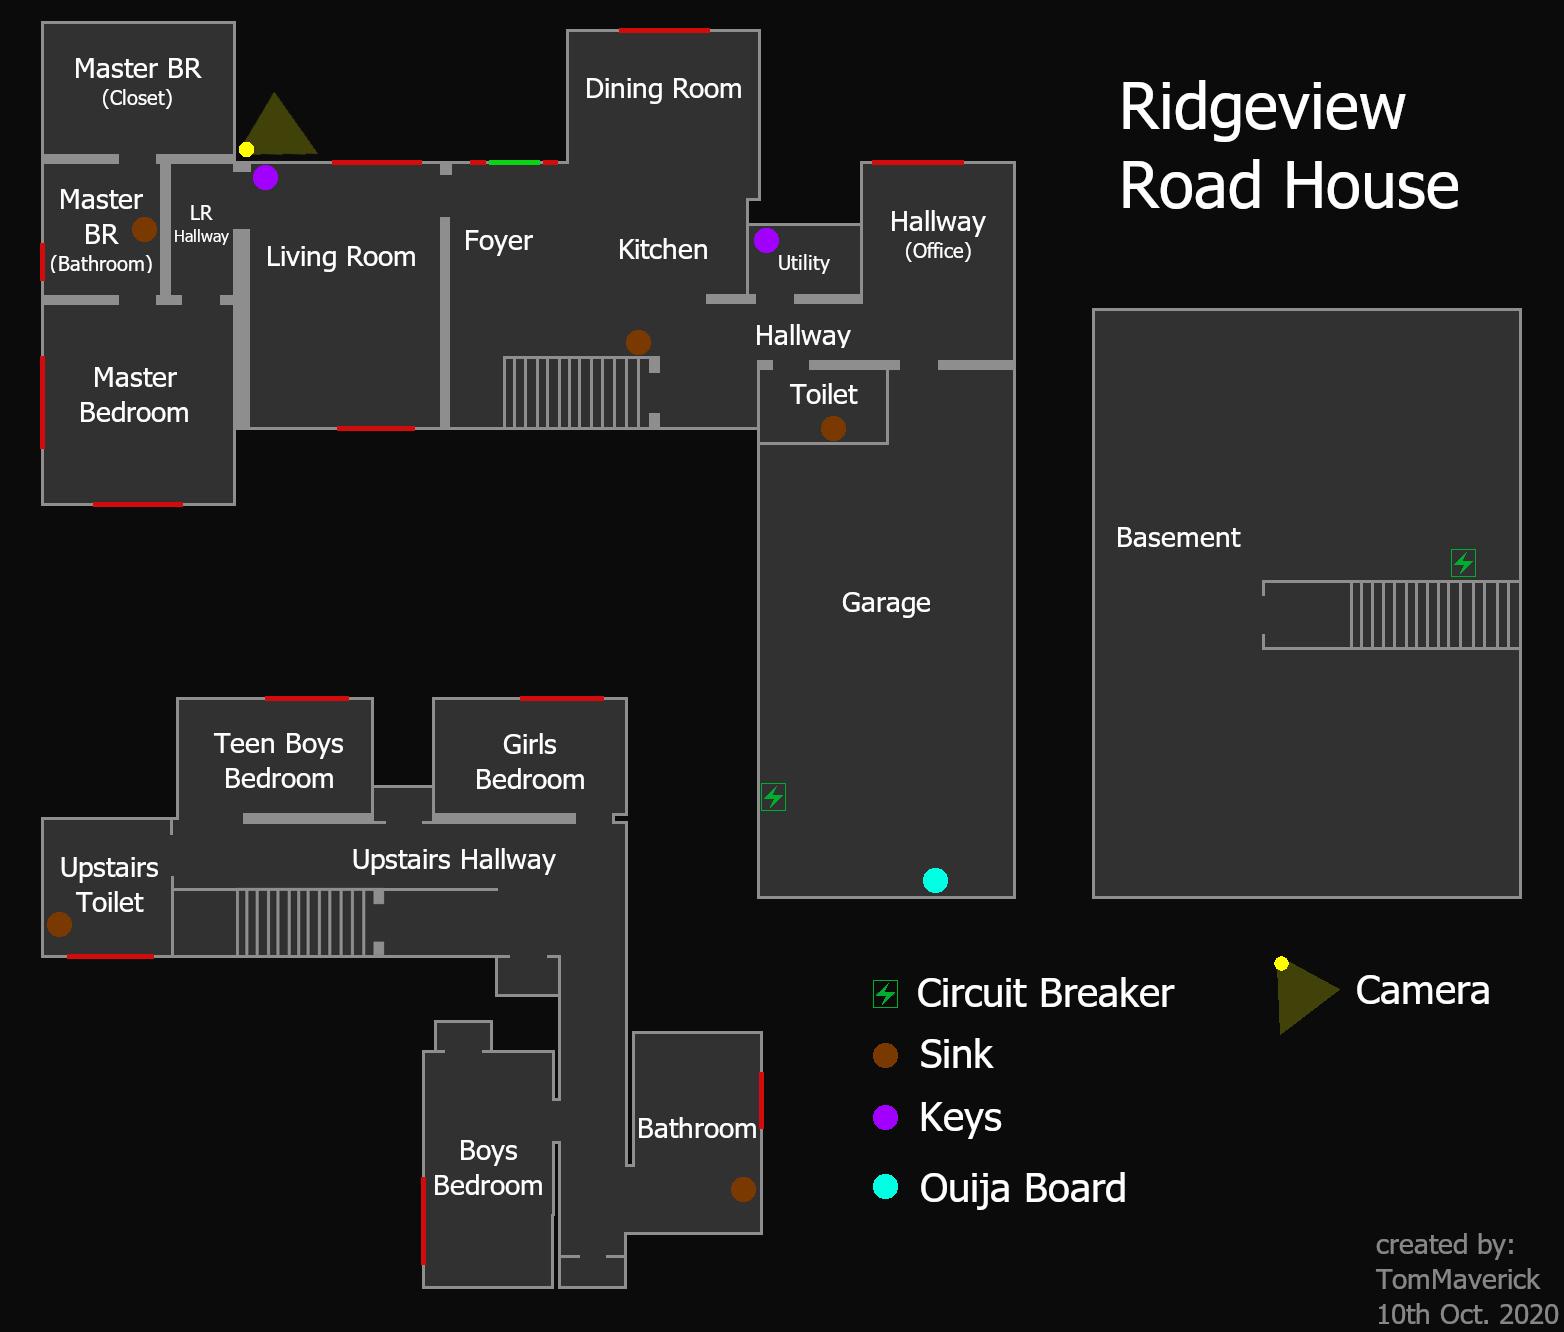 ridgeview_road_house.jpg